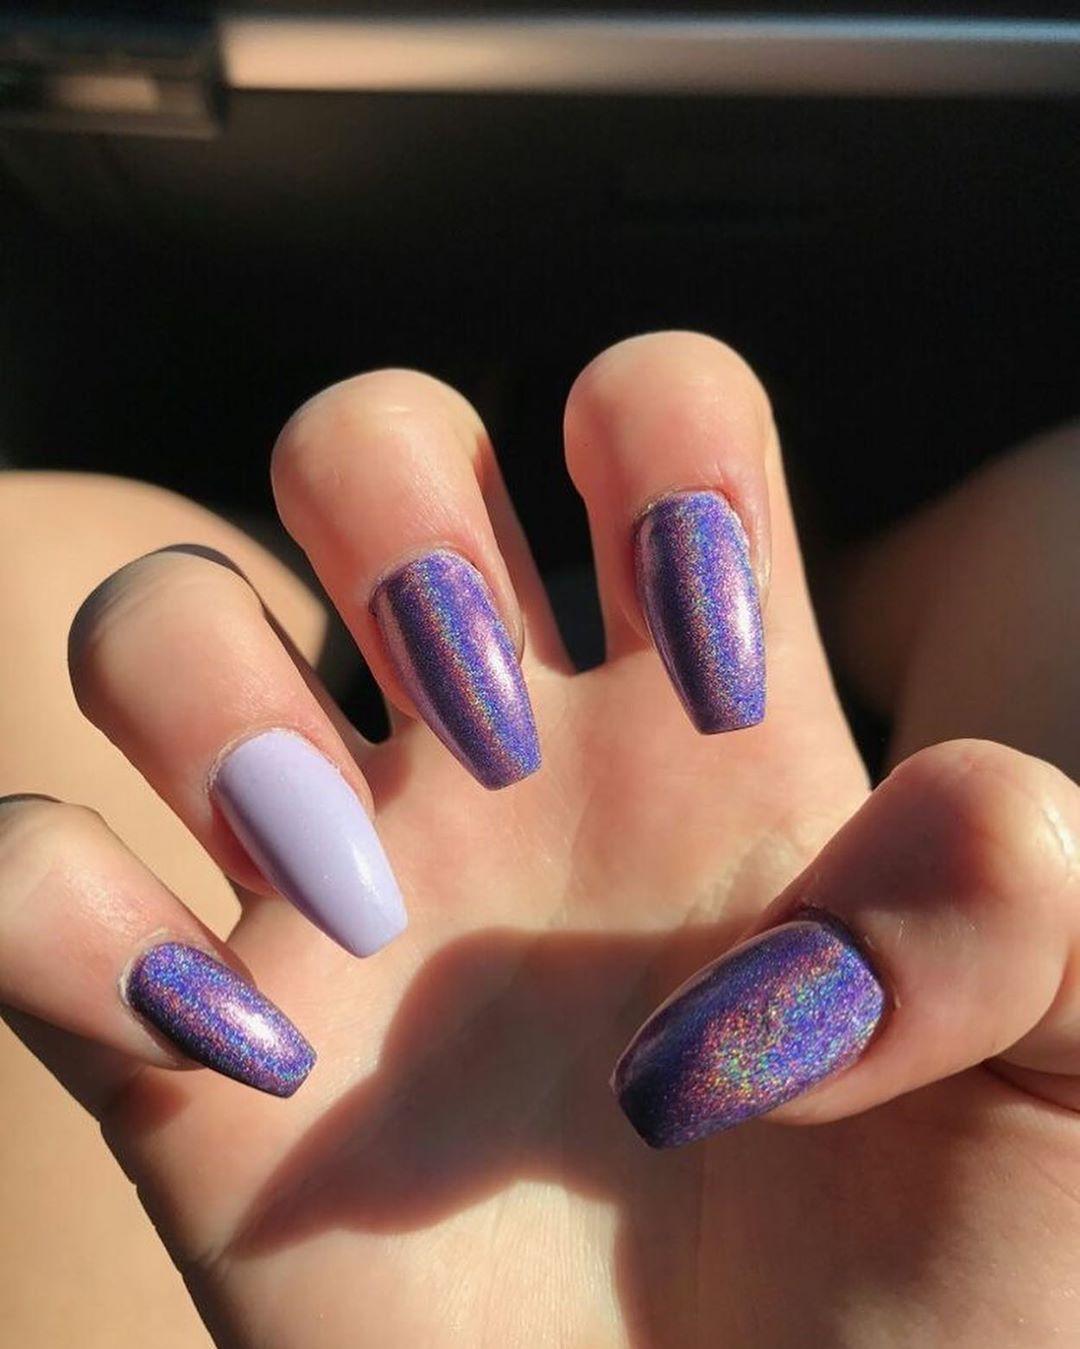 Fingernail Art Ideas Marble Nail Art Creative Nail Design Nail Salon Design Basic Nail Designs Lat Holographic Nails Acrylic Rhinestone Nails Halographic Nails